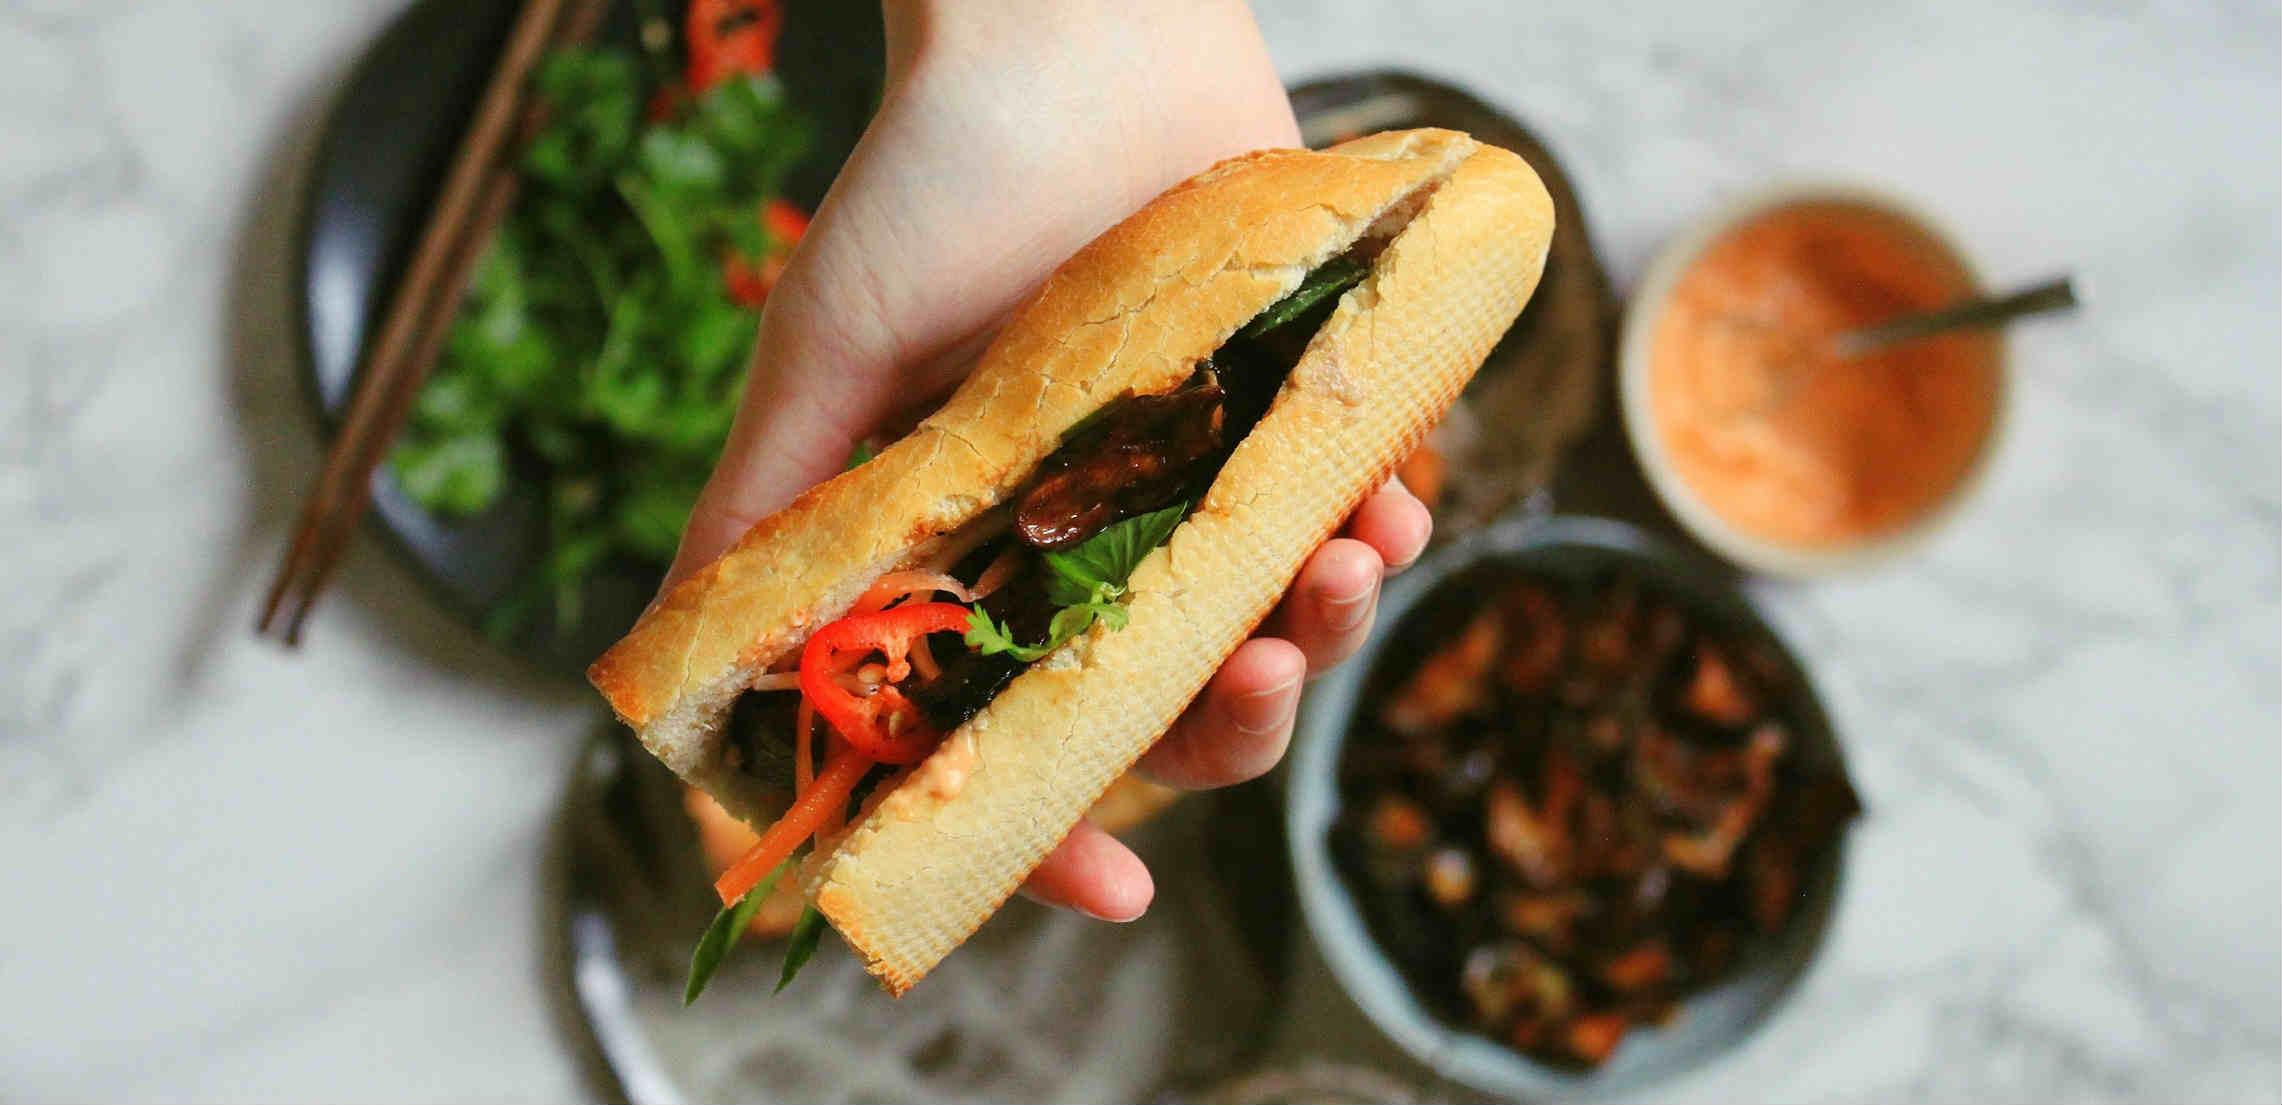 Vegan Vietnamese food in London